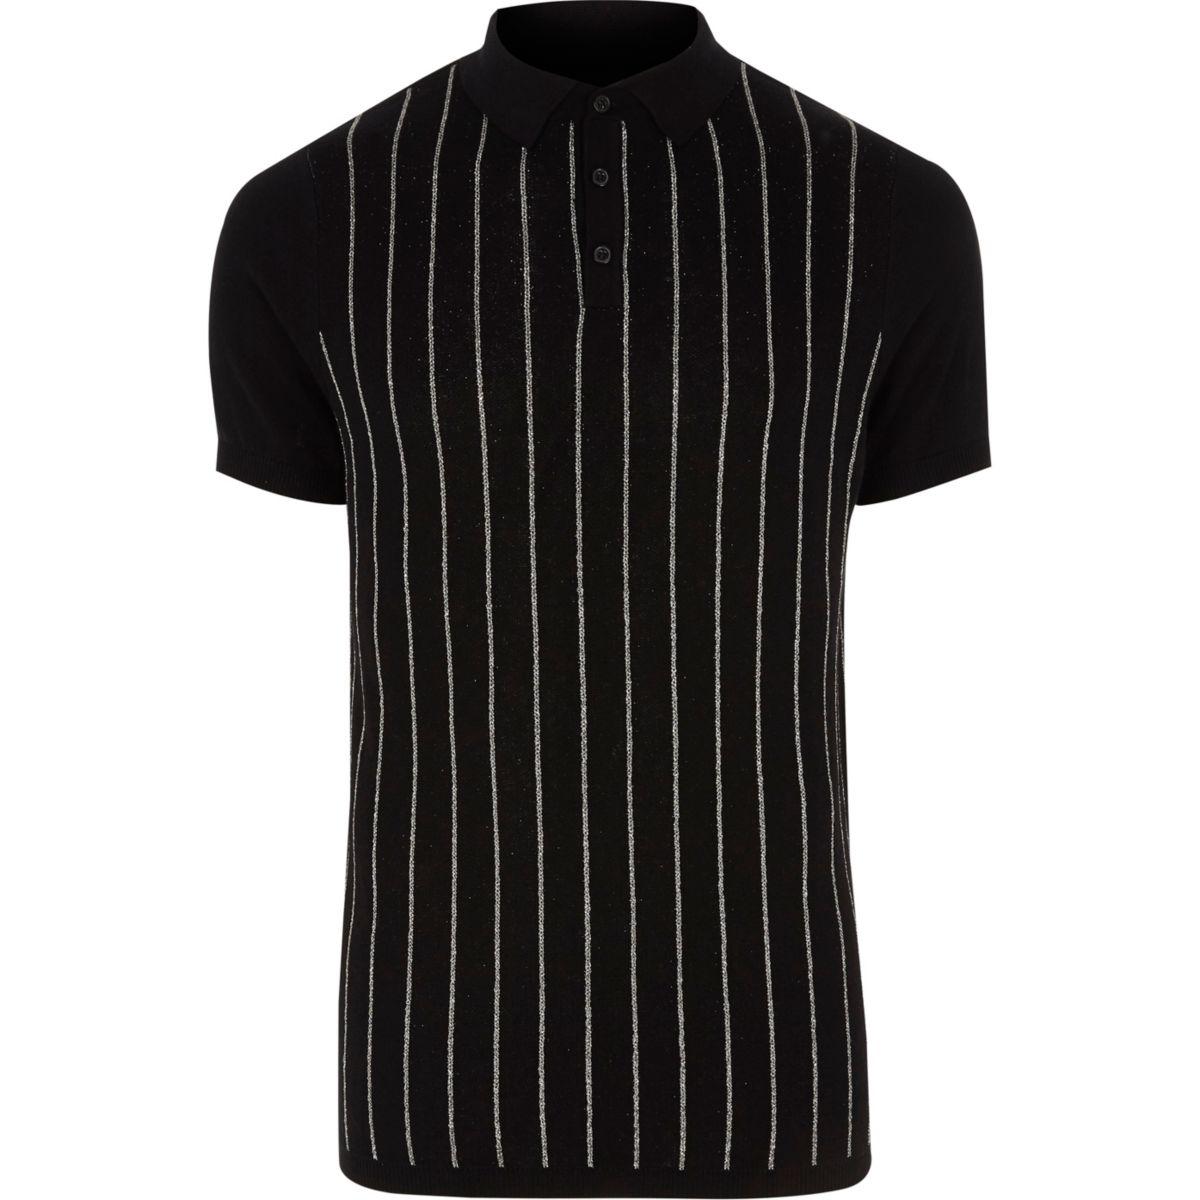 Black glitter stripe knitted polo shirt